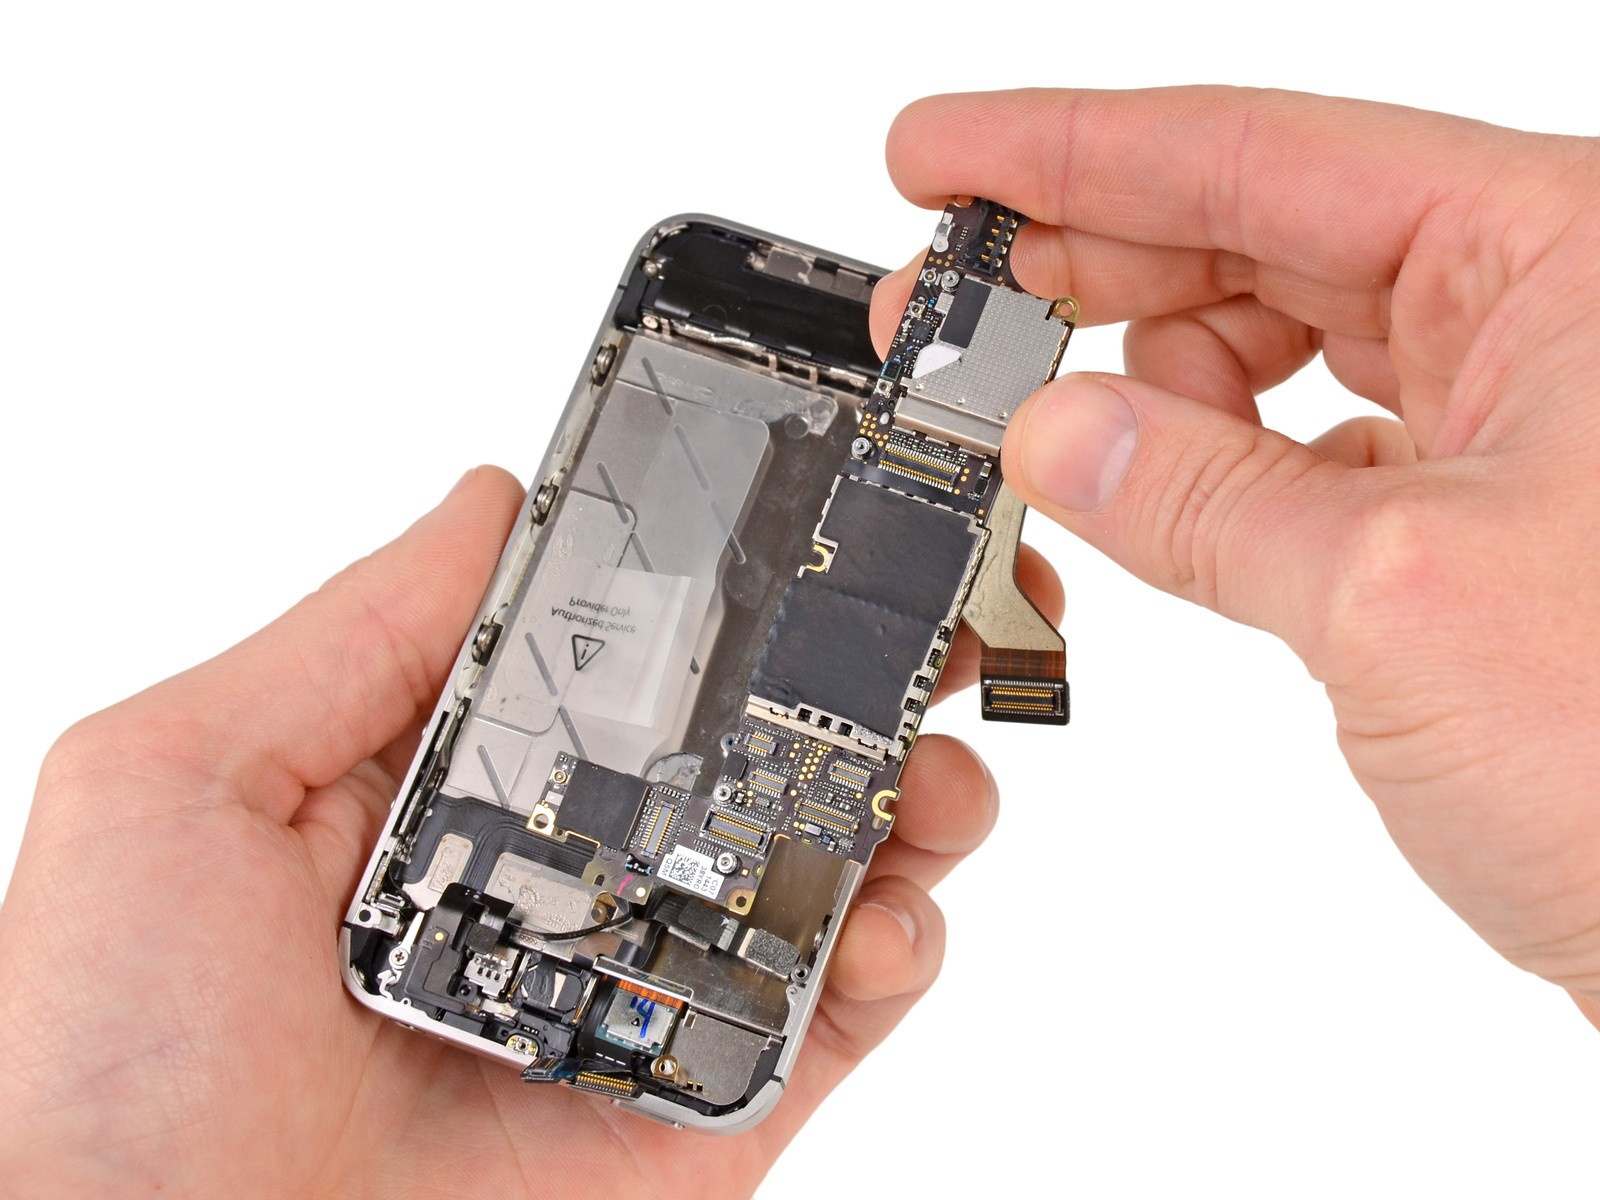 Sửa lỗi nút home bị liệt - sửa main iPhone 4S